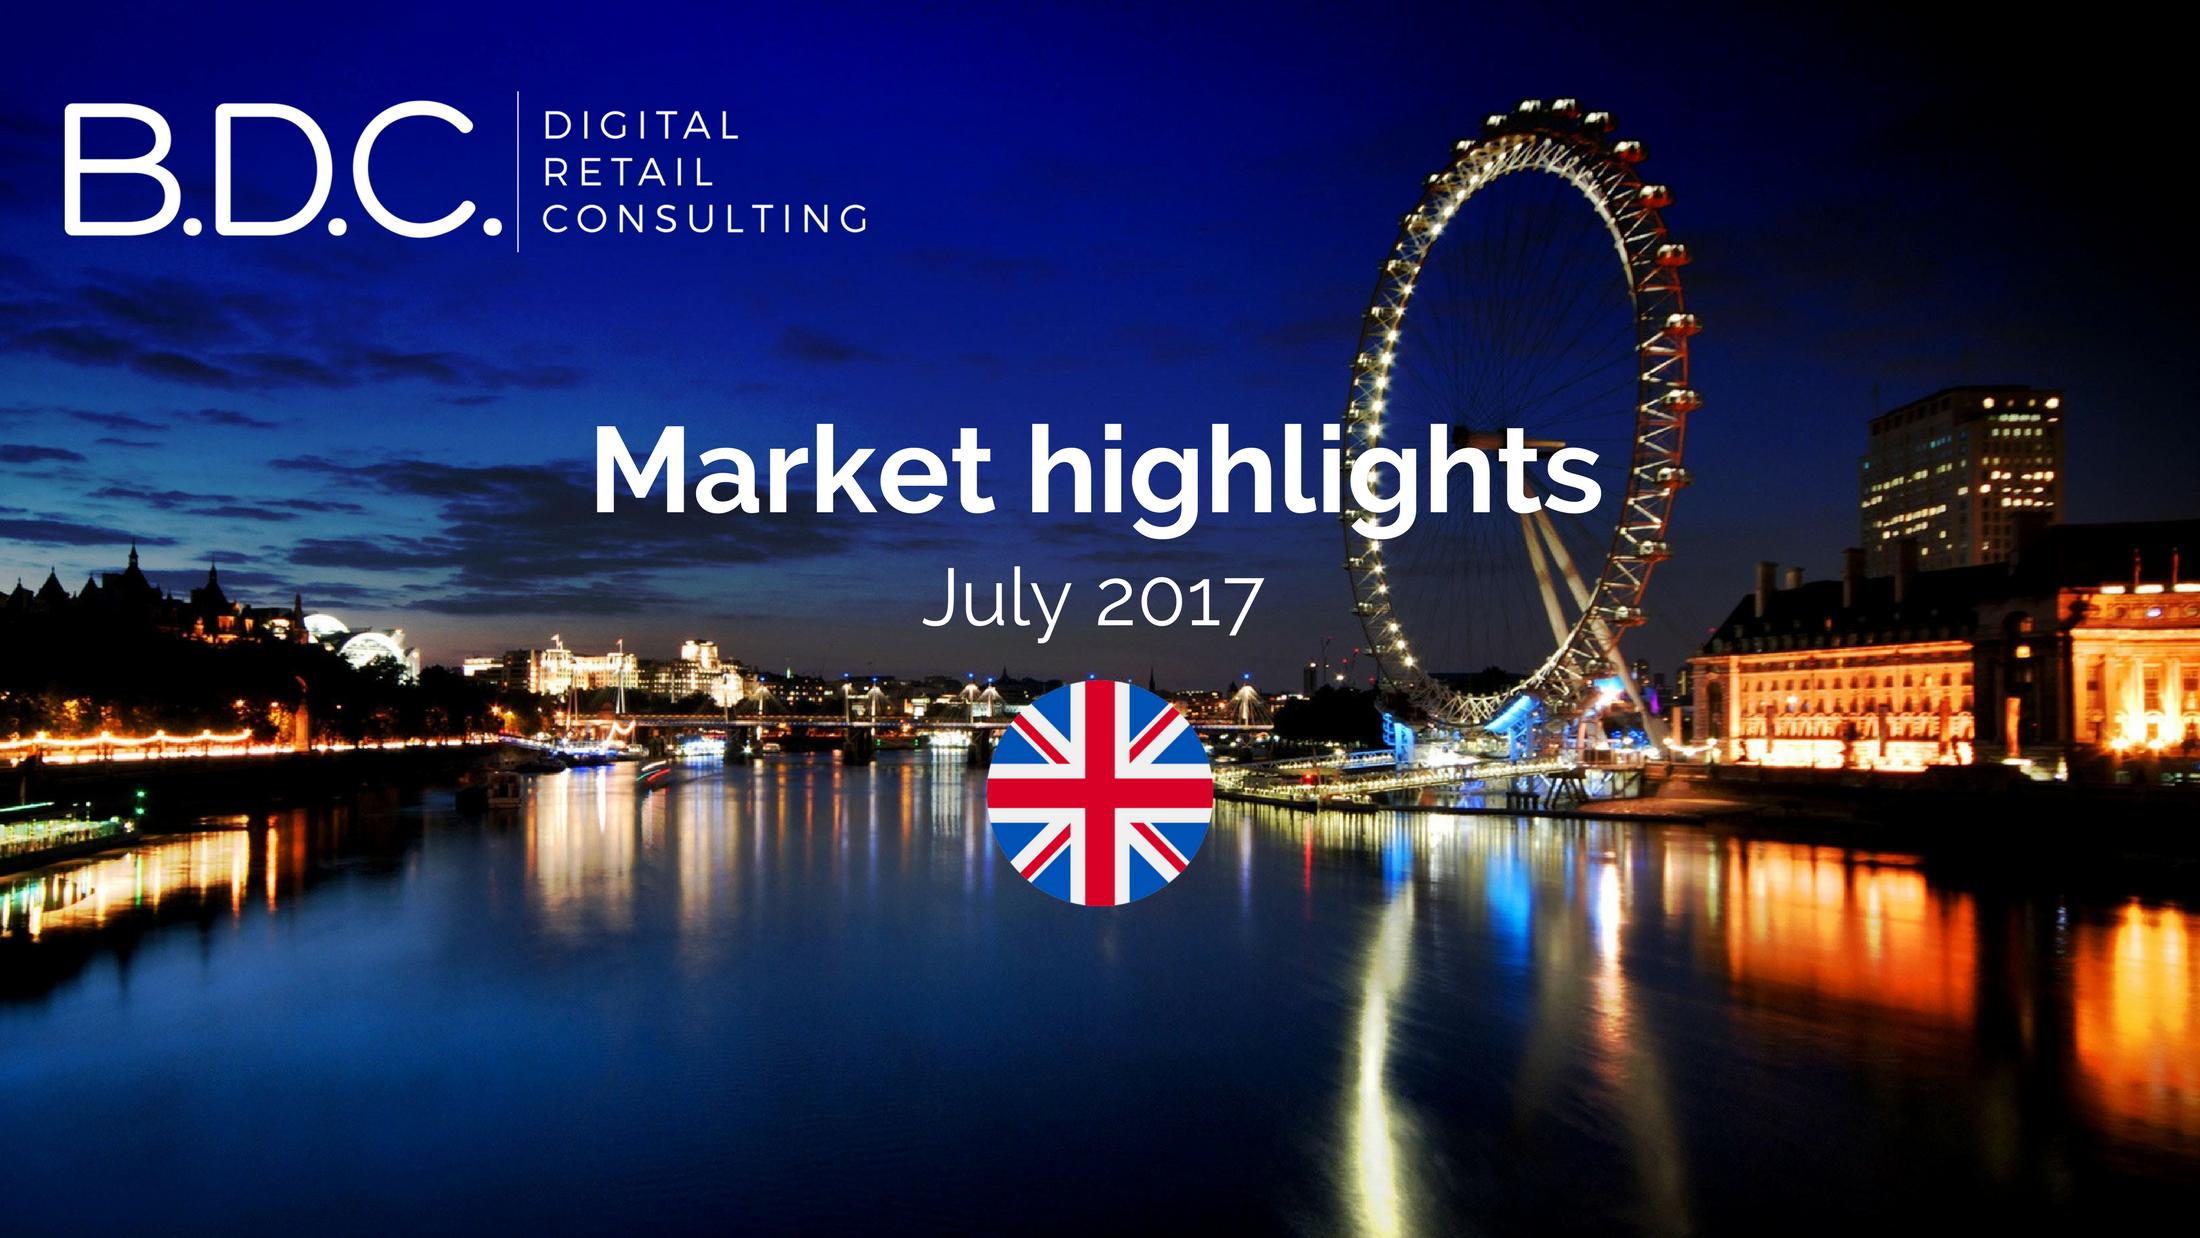 Trends News 2 - Market highlights - July 2017